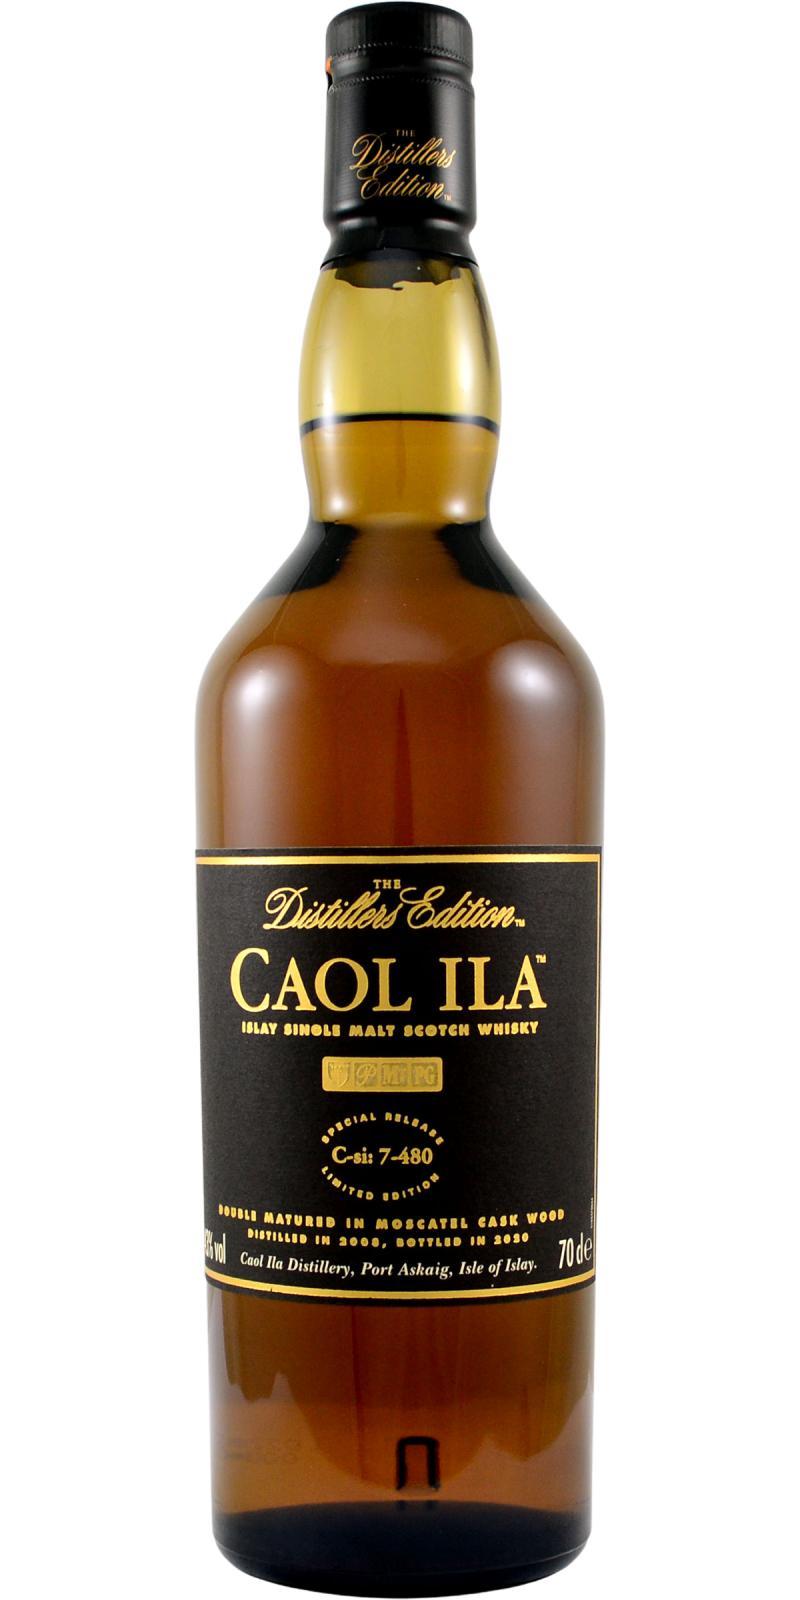 Caol Ila 2008